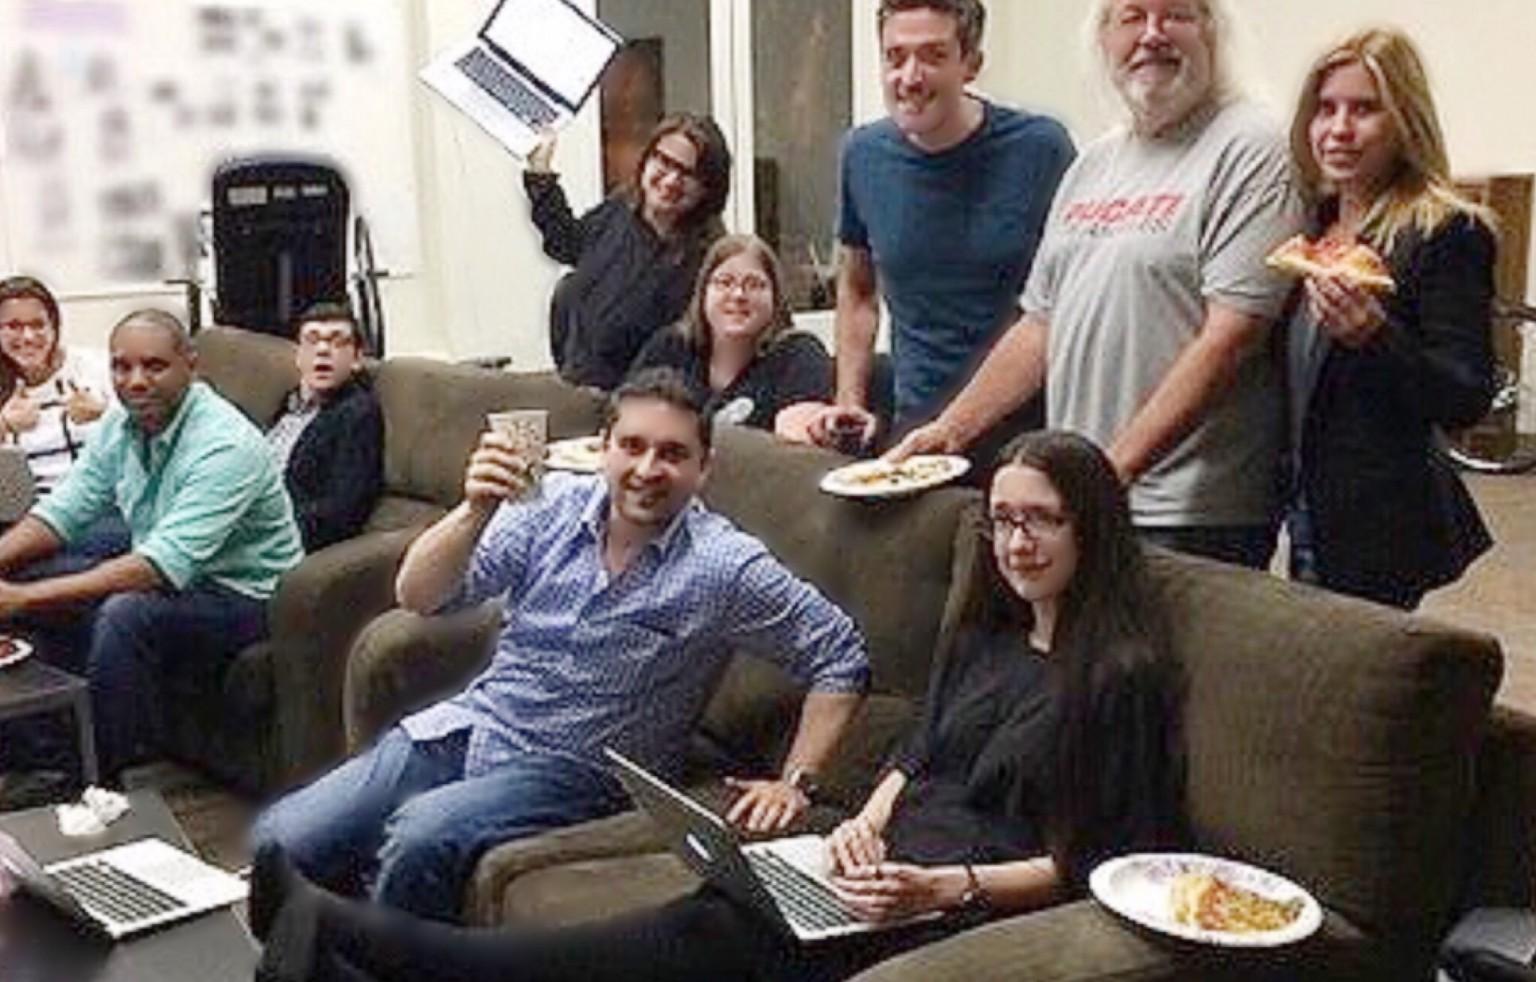 L to R: @Tay2theLO, @BrandonBSonnier, @schecpiece, @hlb323 (holding laptop), @BrandonMargolis (holding cup), Sam C (gal next to helen), @JonBokenkamp, @nicoledphillips (seated w laptop), @Daniel_Knauf, @AlbaMezzoGiorno